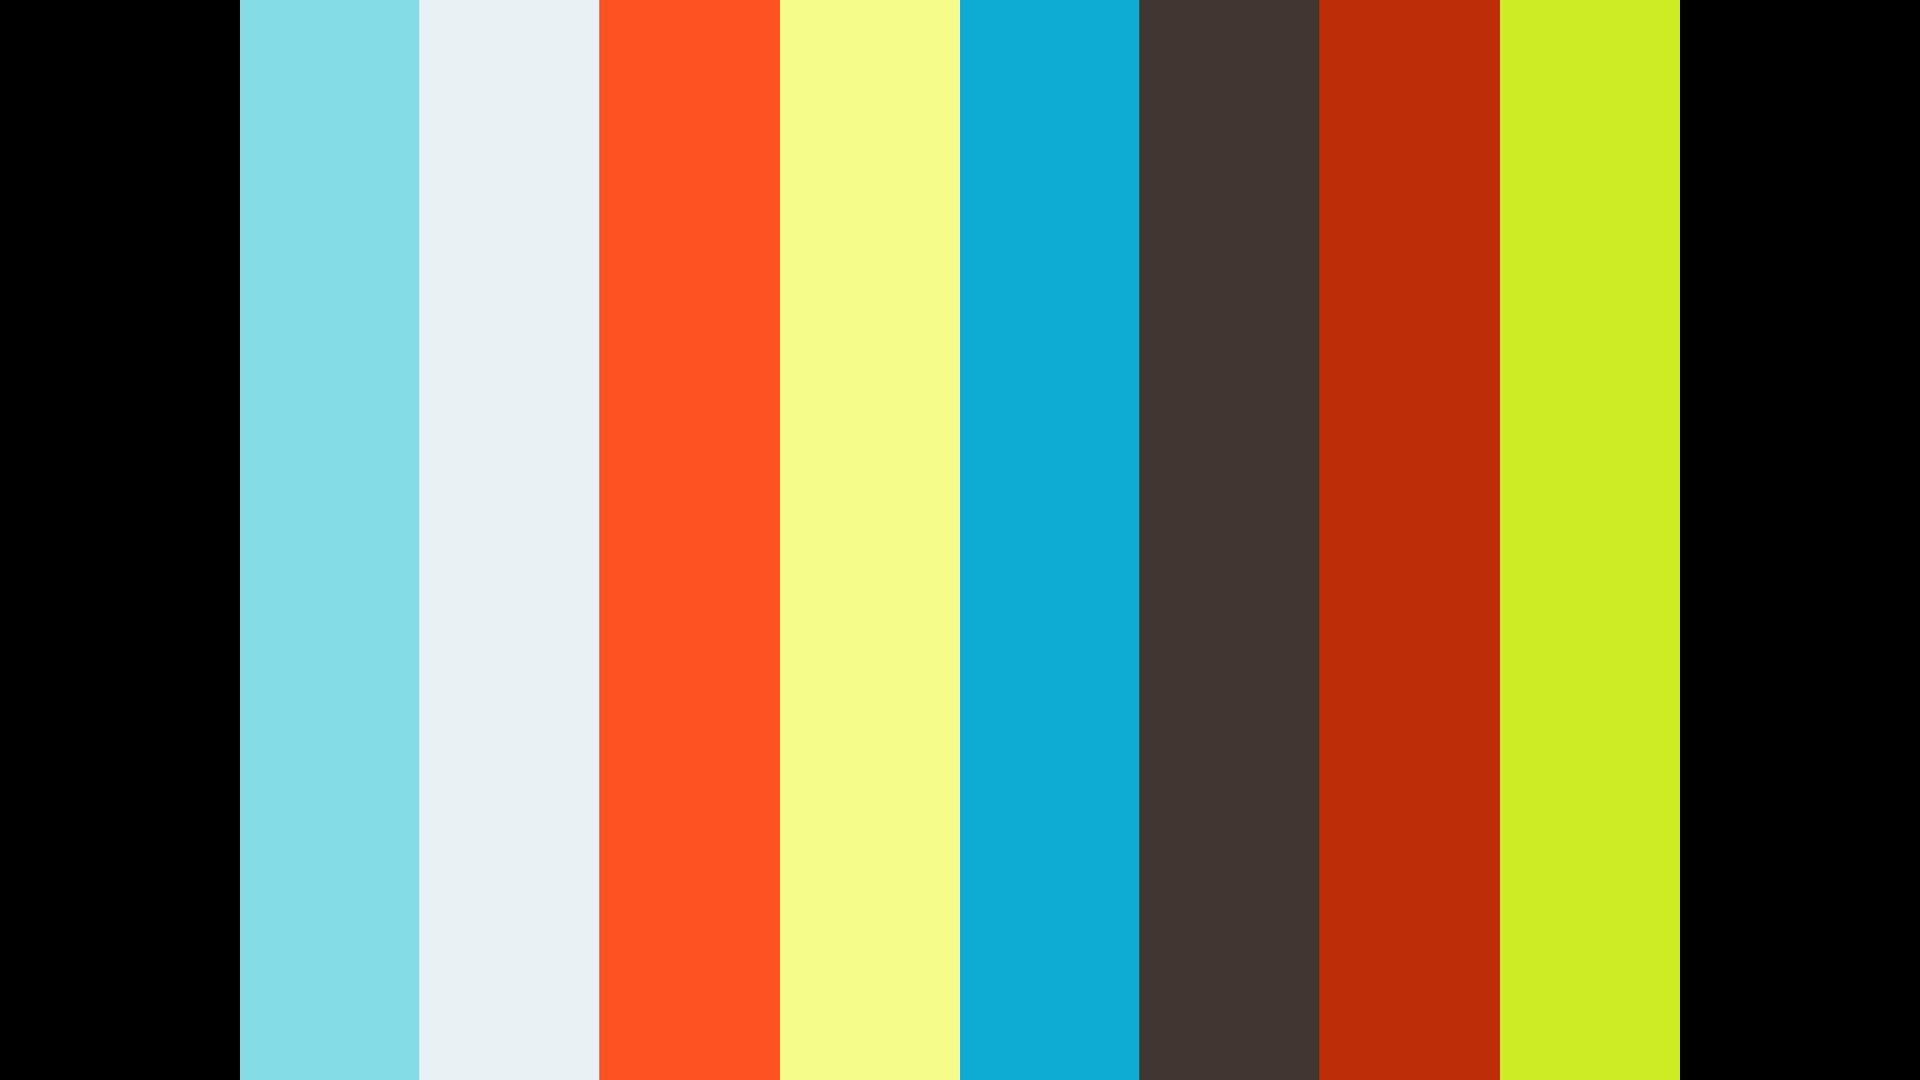 Audio Reacting Strings [Simple Form Test]